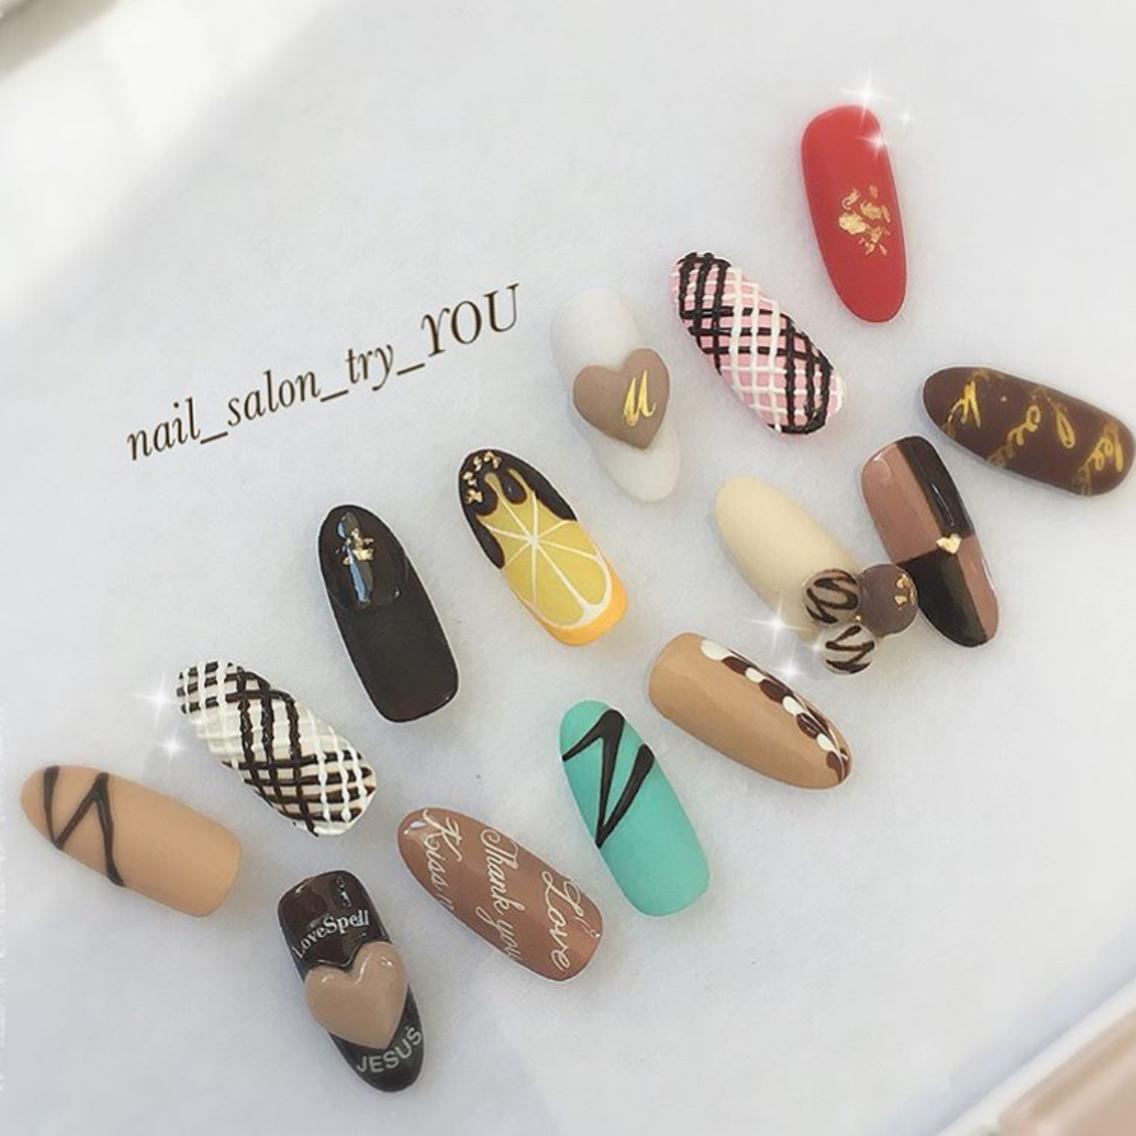 nail_salon_try_YOU所属・nail_salontry_YOUの掲載